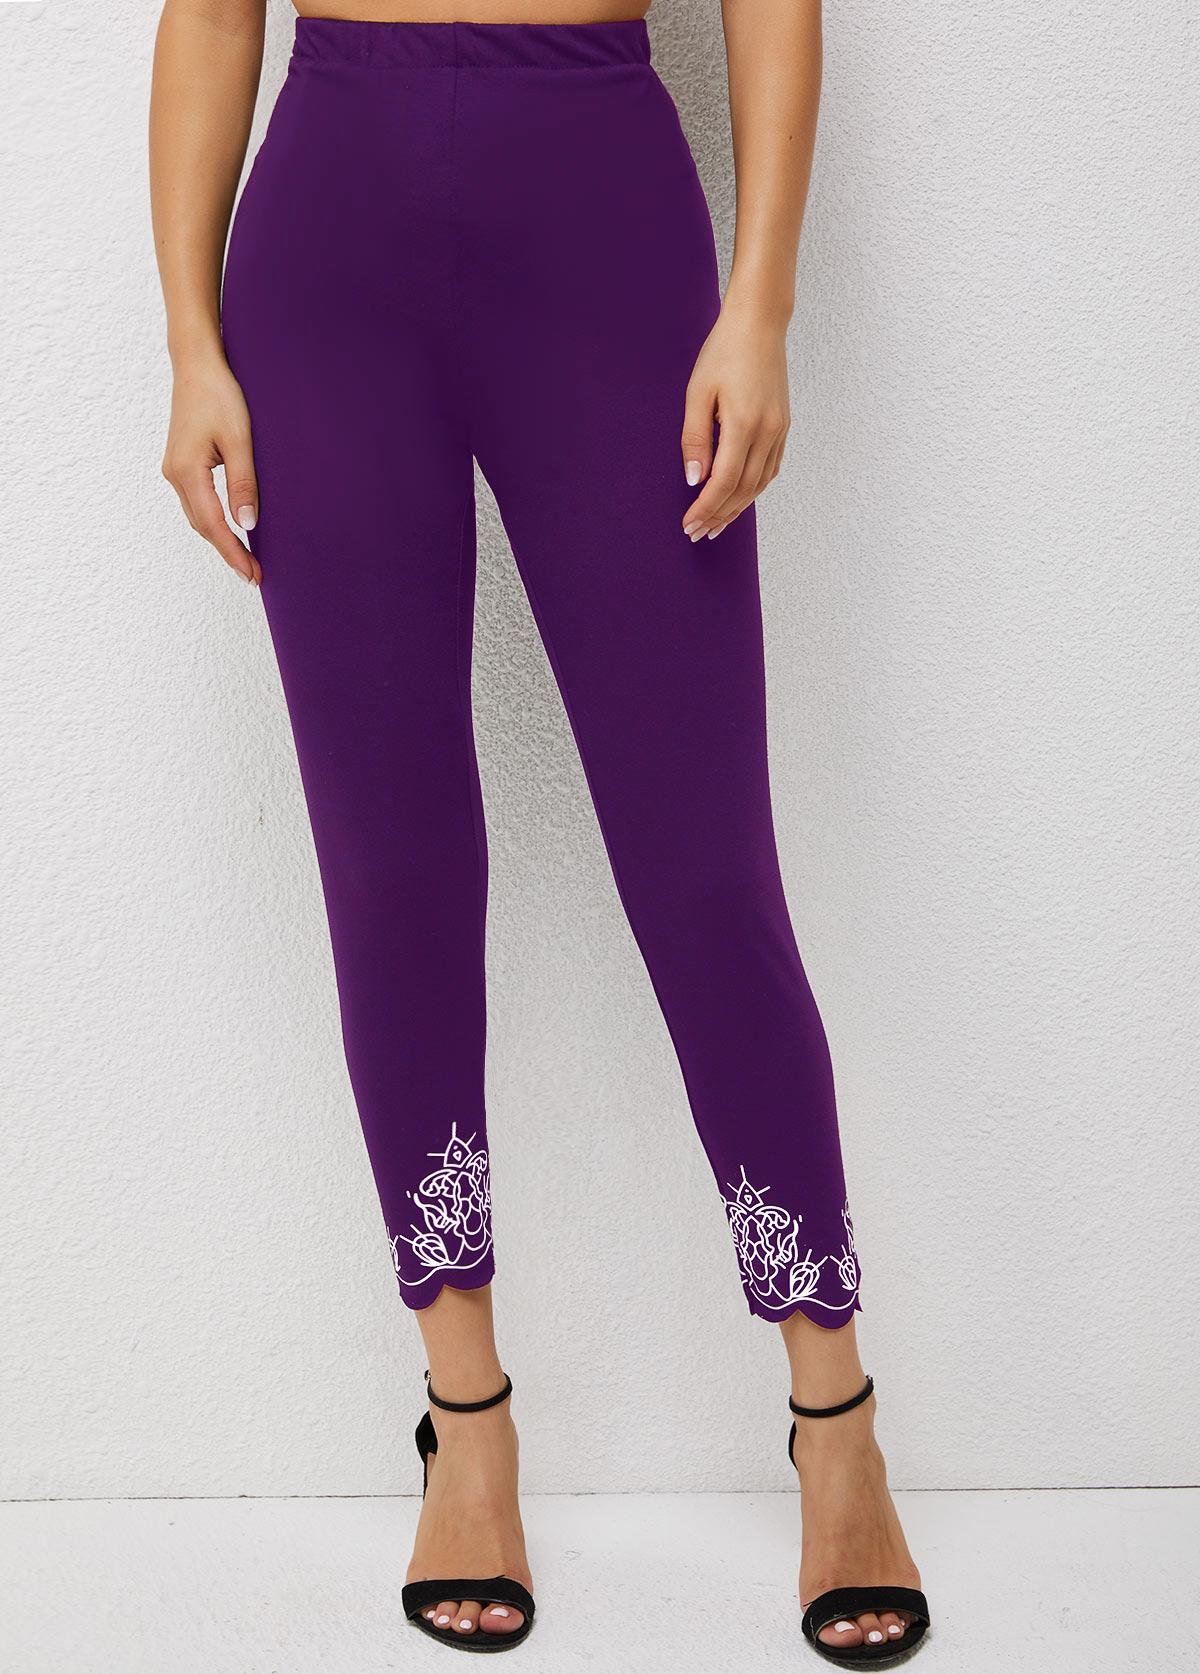 Skinny High Waisted Printed Pierced Pants